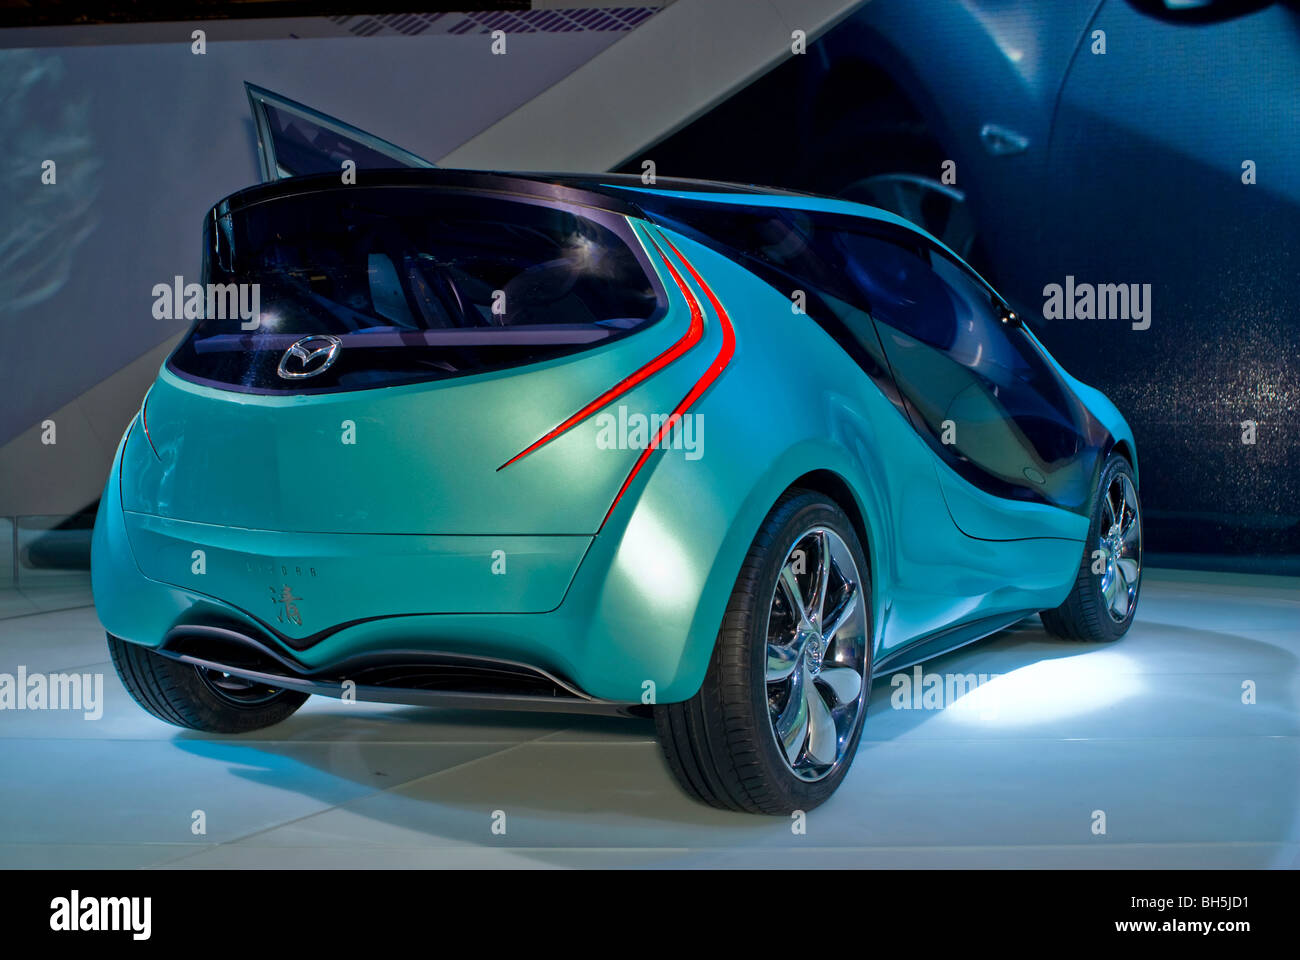 https://c8.alamy.com/comp/BH5JD1/paris-france-paris-auto-show-electric-motor-concept-car-mazda-kiyora-BH5JD1.jpg